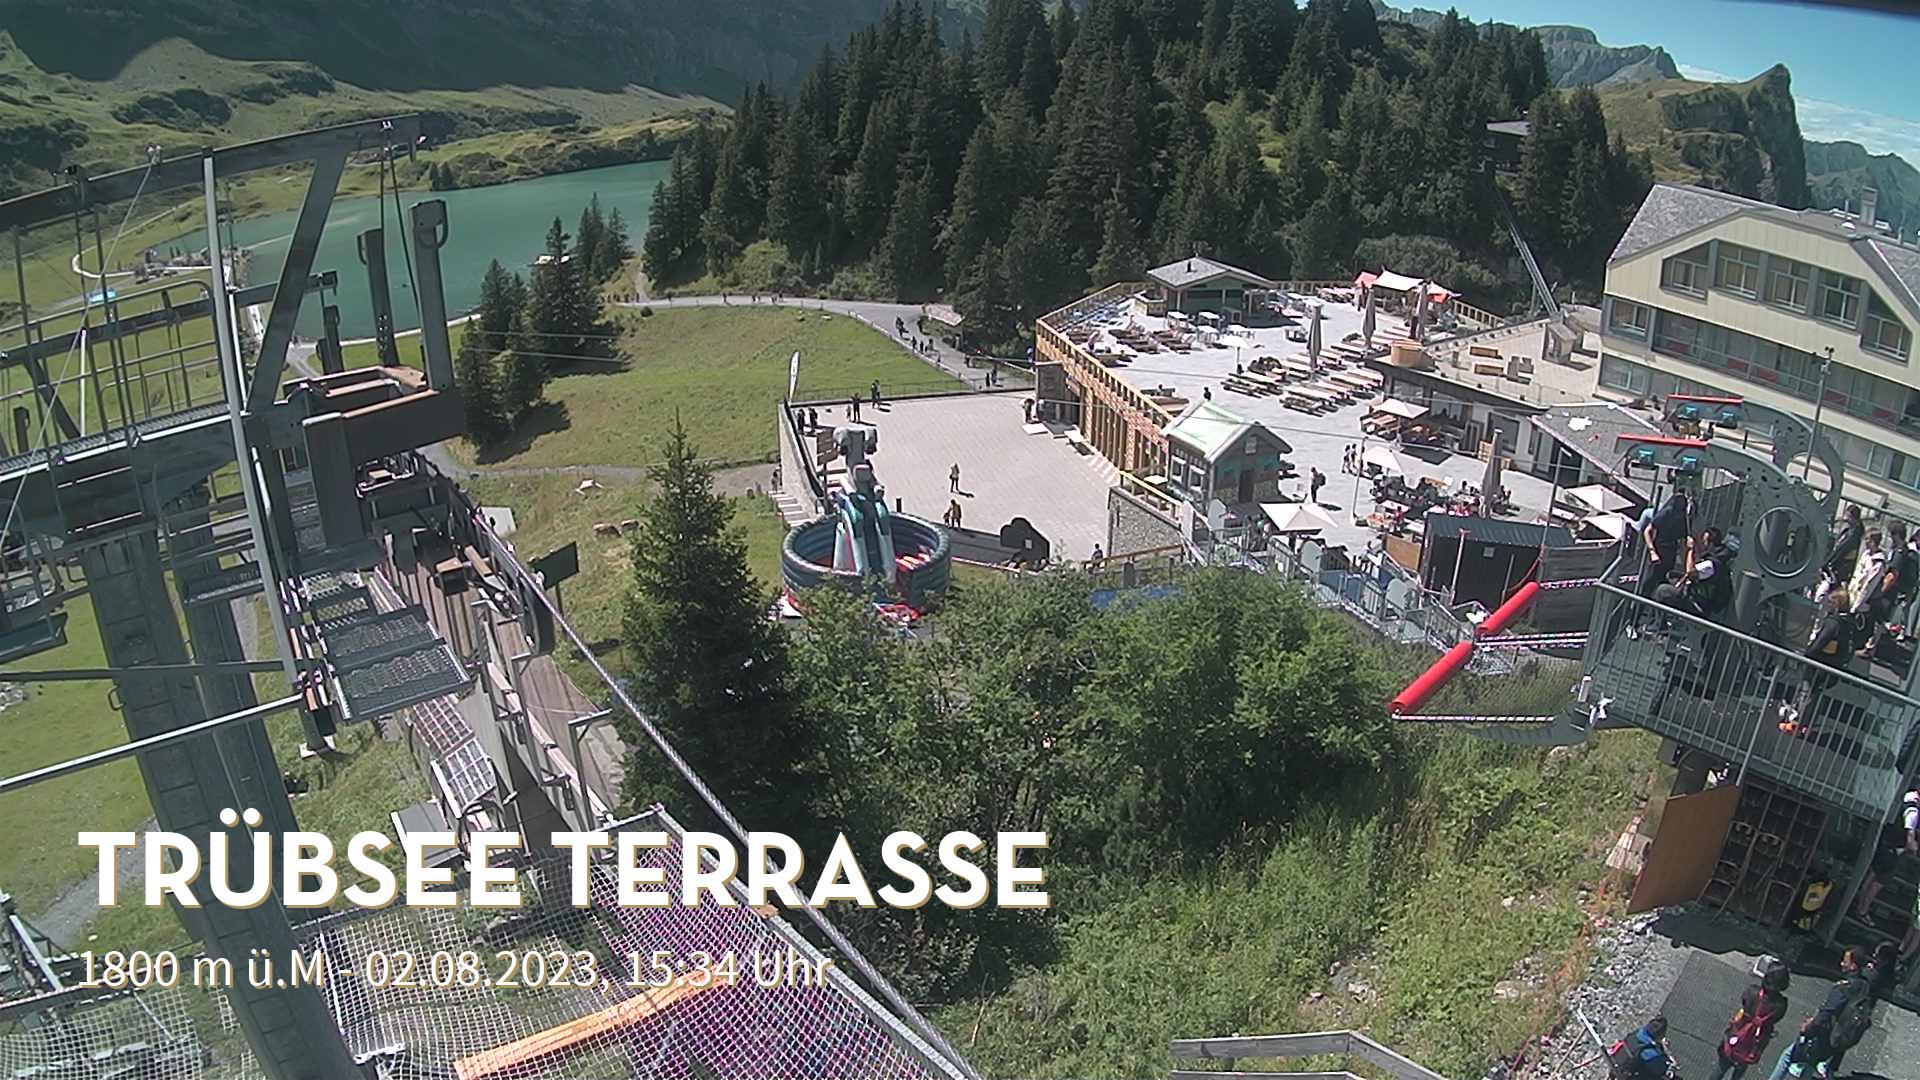 Engelberg webcam - Truebsee Talva ski station